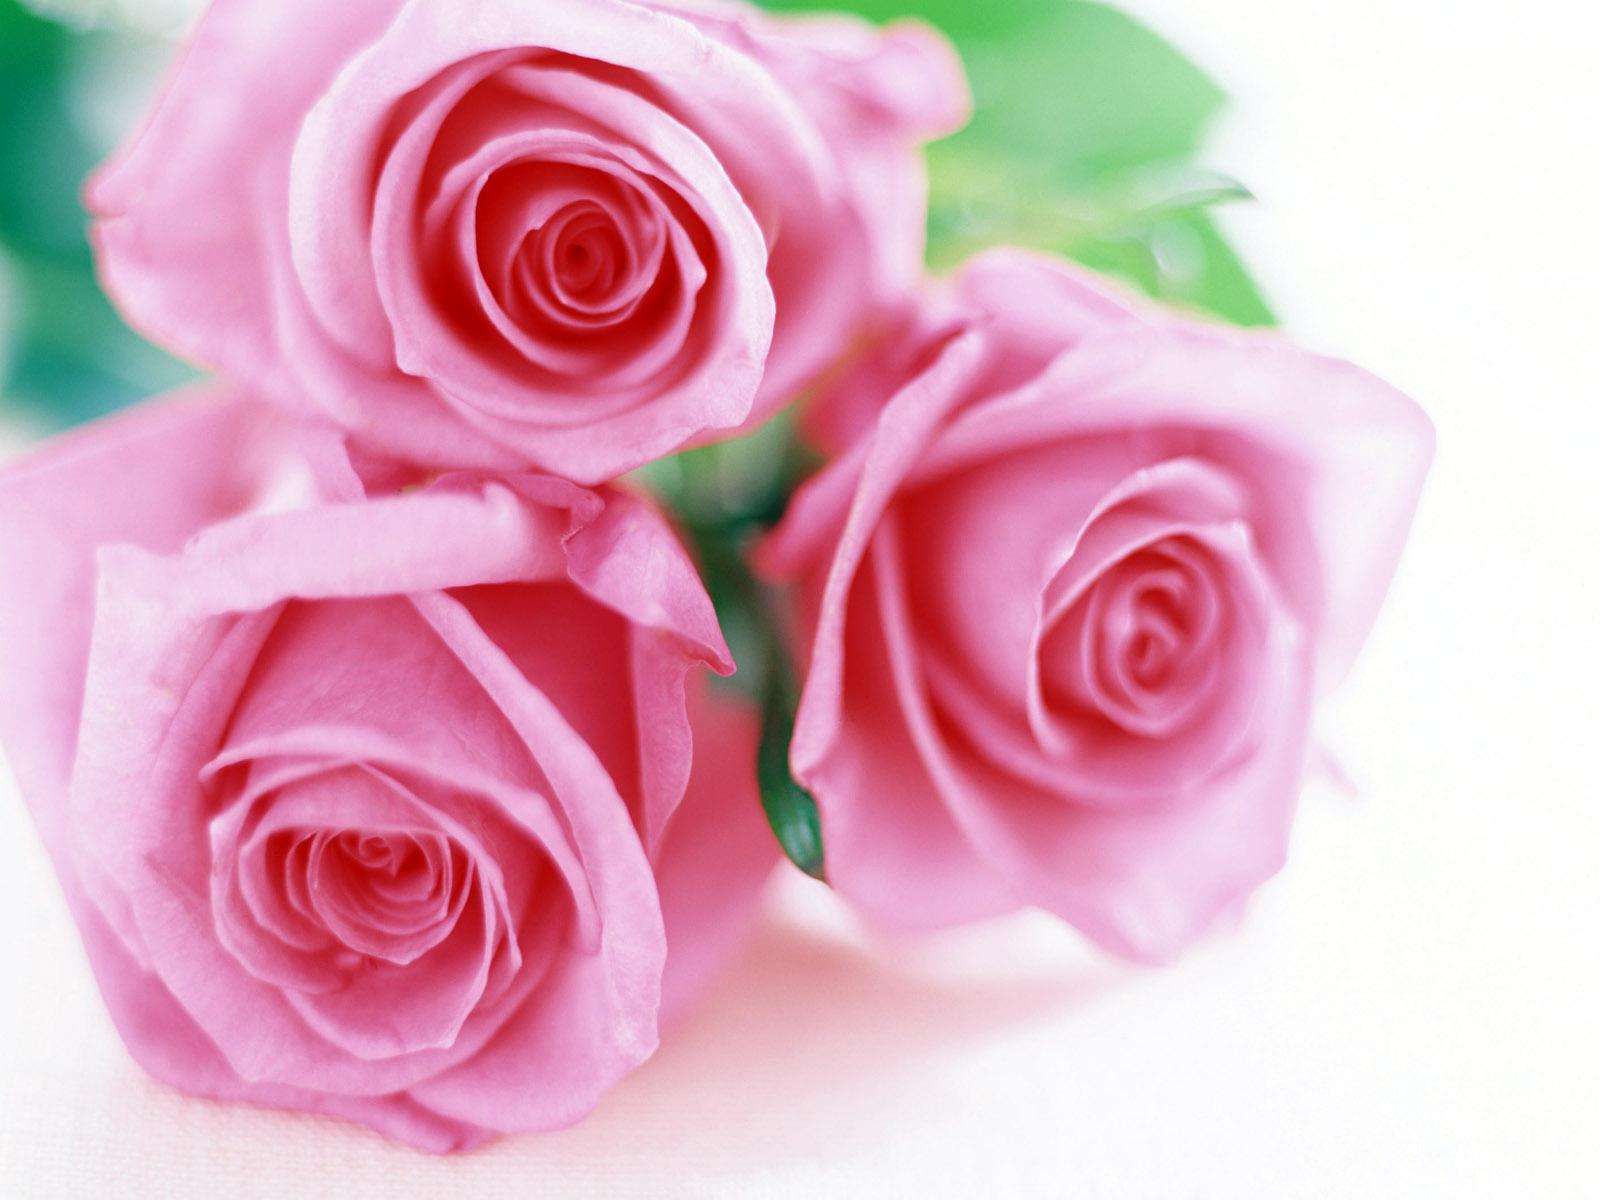 http://4.bp.blogspot.com/--QhU60Ss-LQ/T8A3efkLL8I/AAAAAAAAAzU/H8D2FpHMBe4/s1600/trandafiri+4.jpg